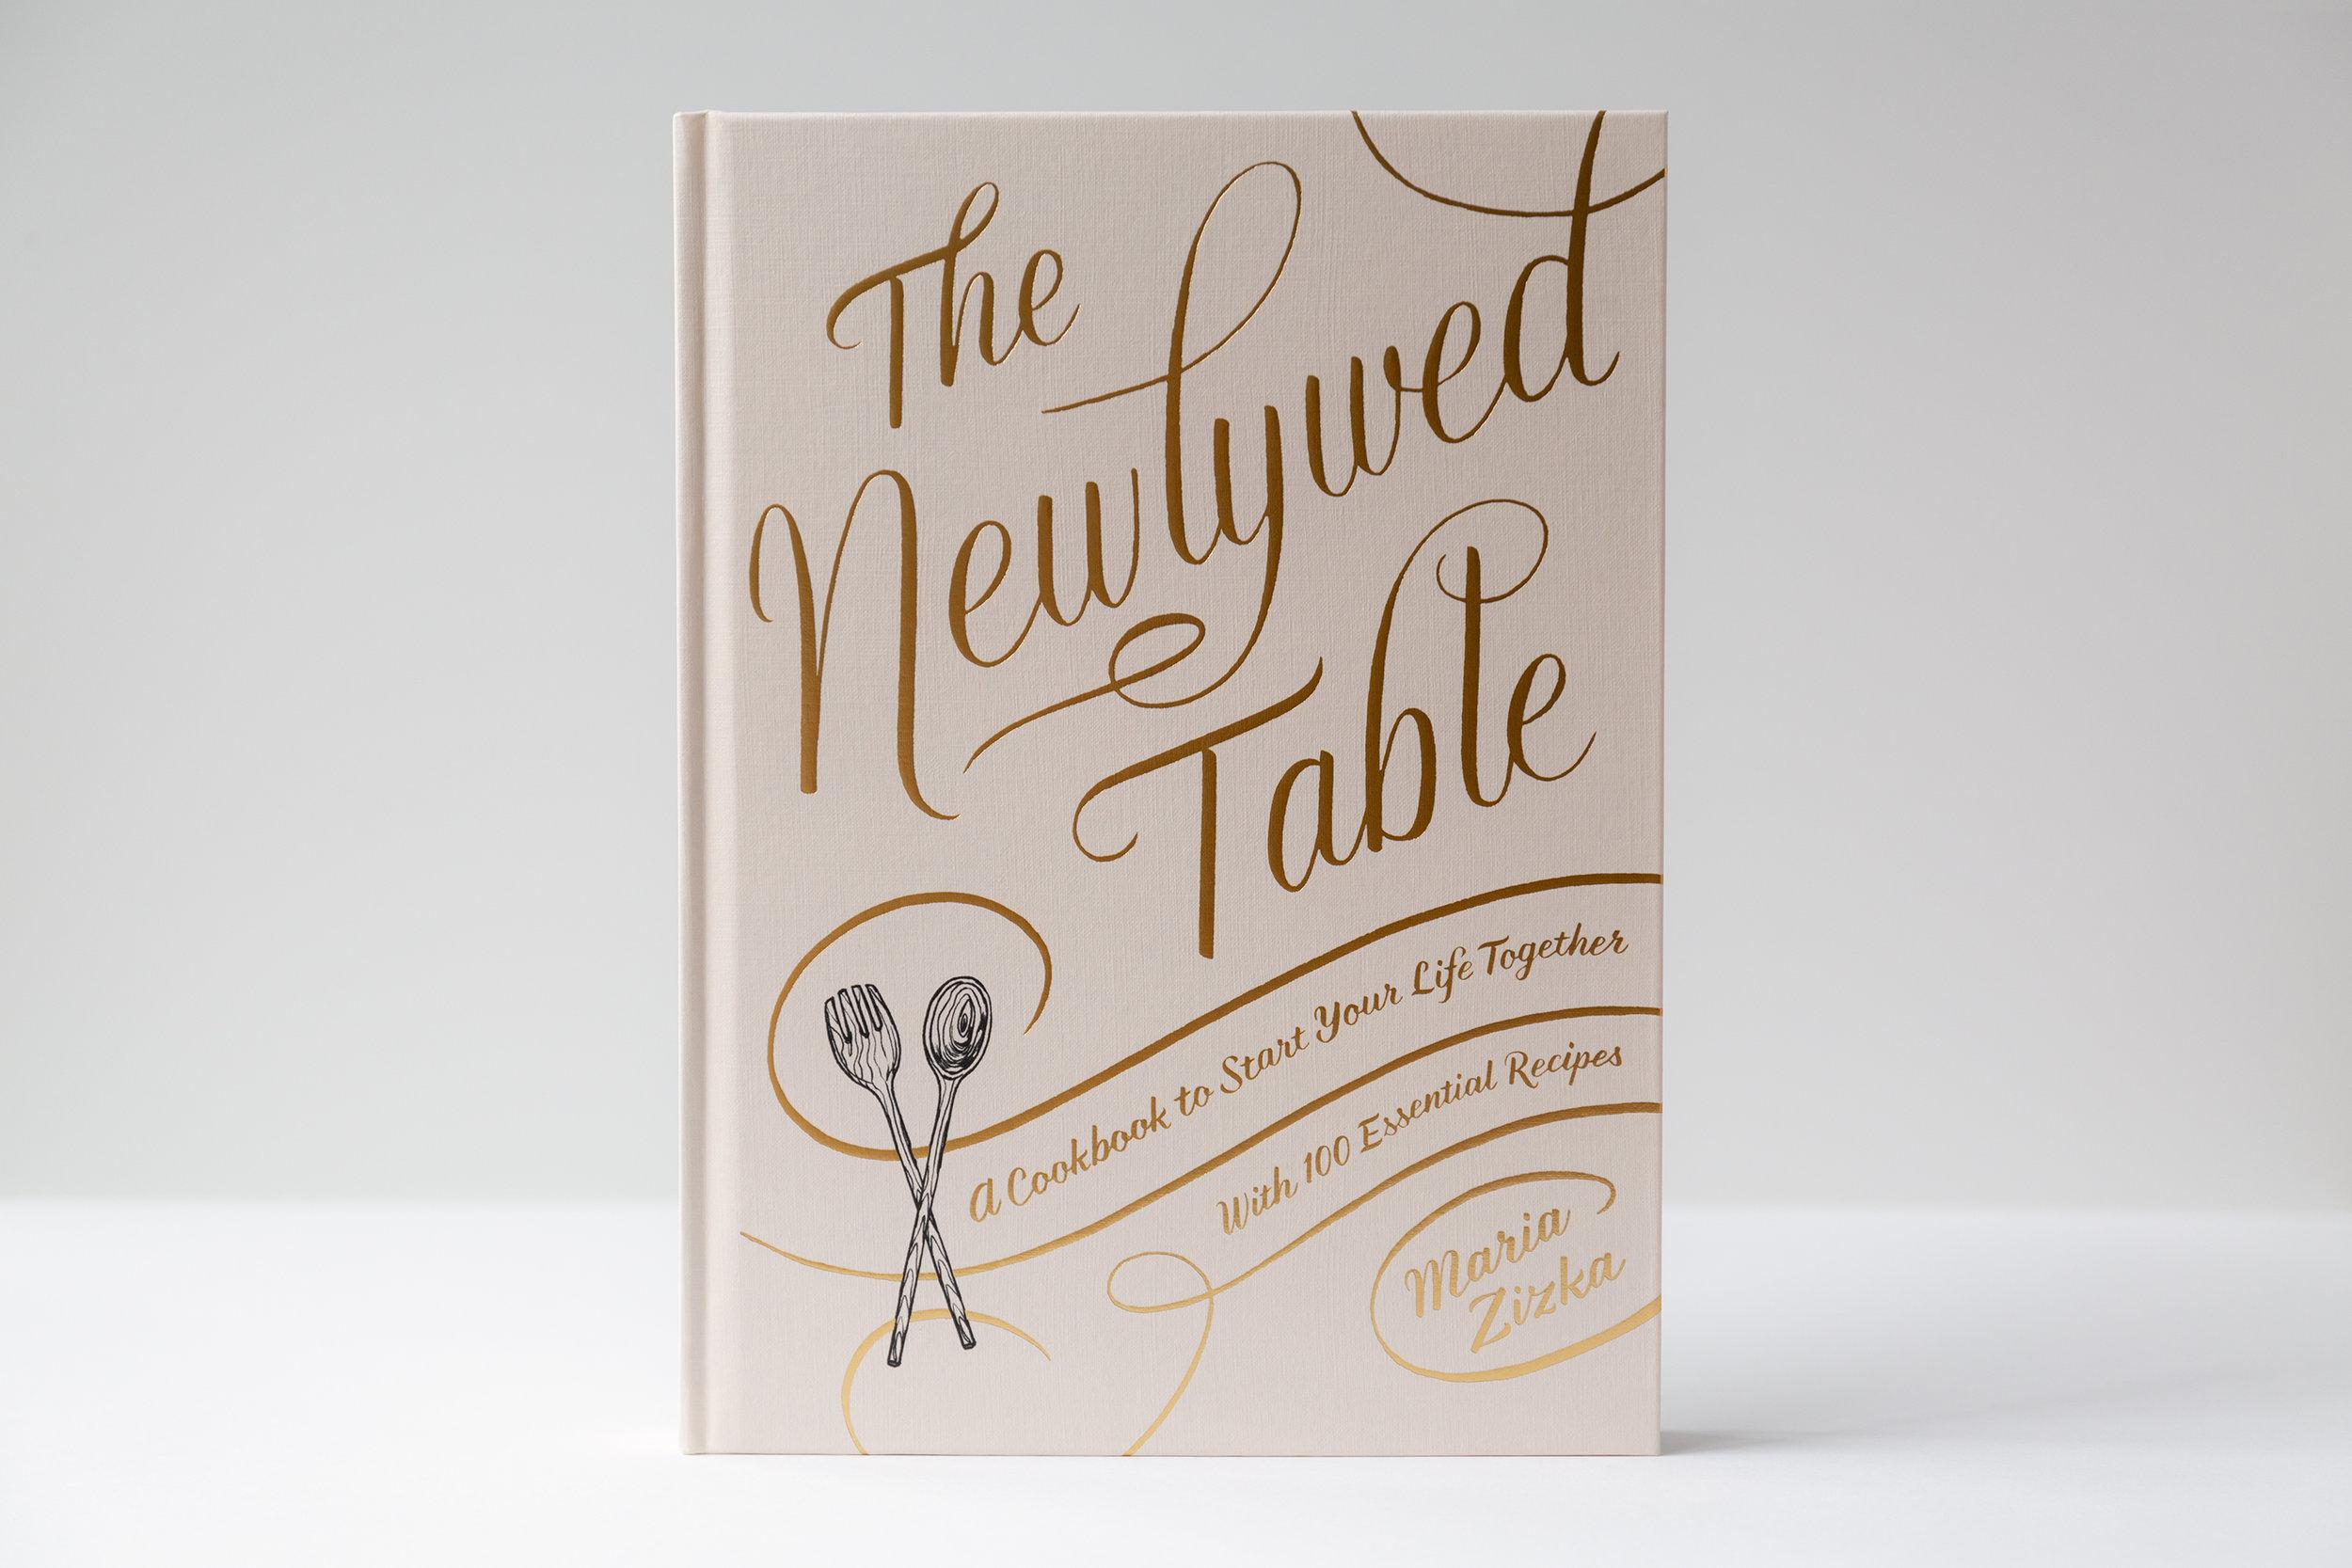 newlywed-table-20190401-23.jpg